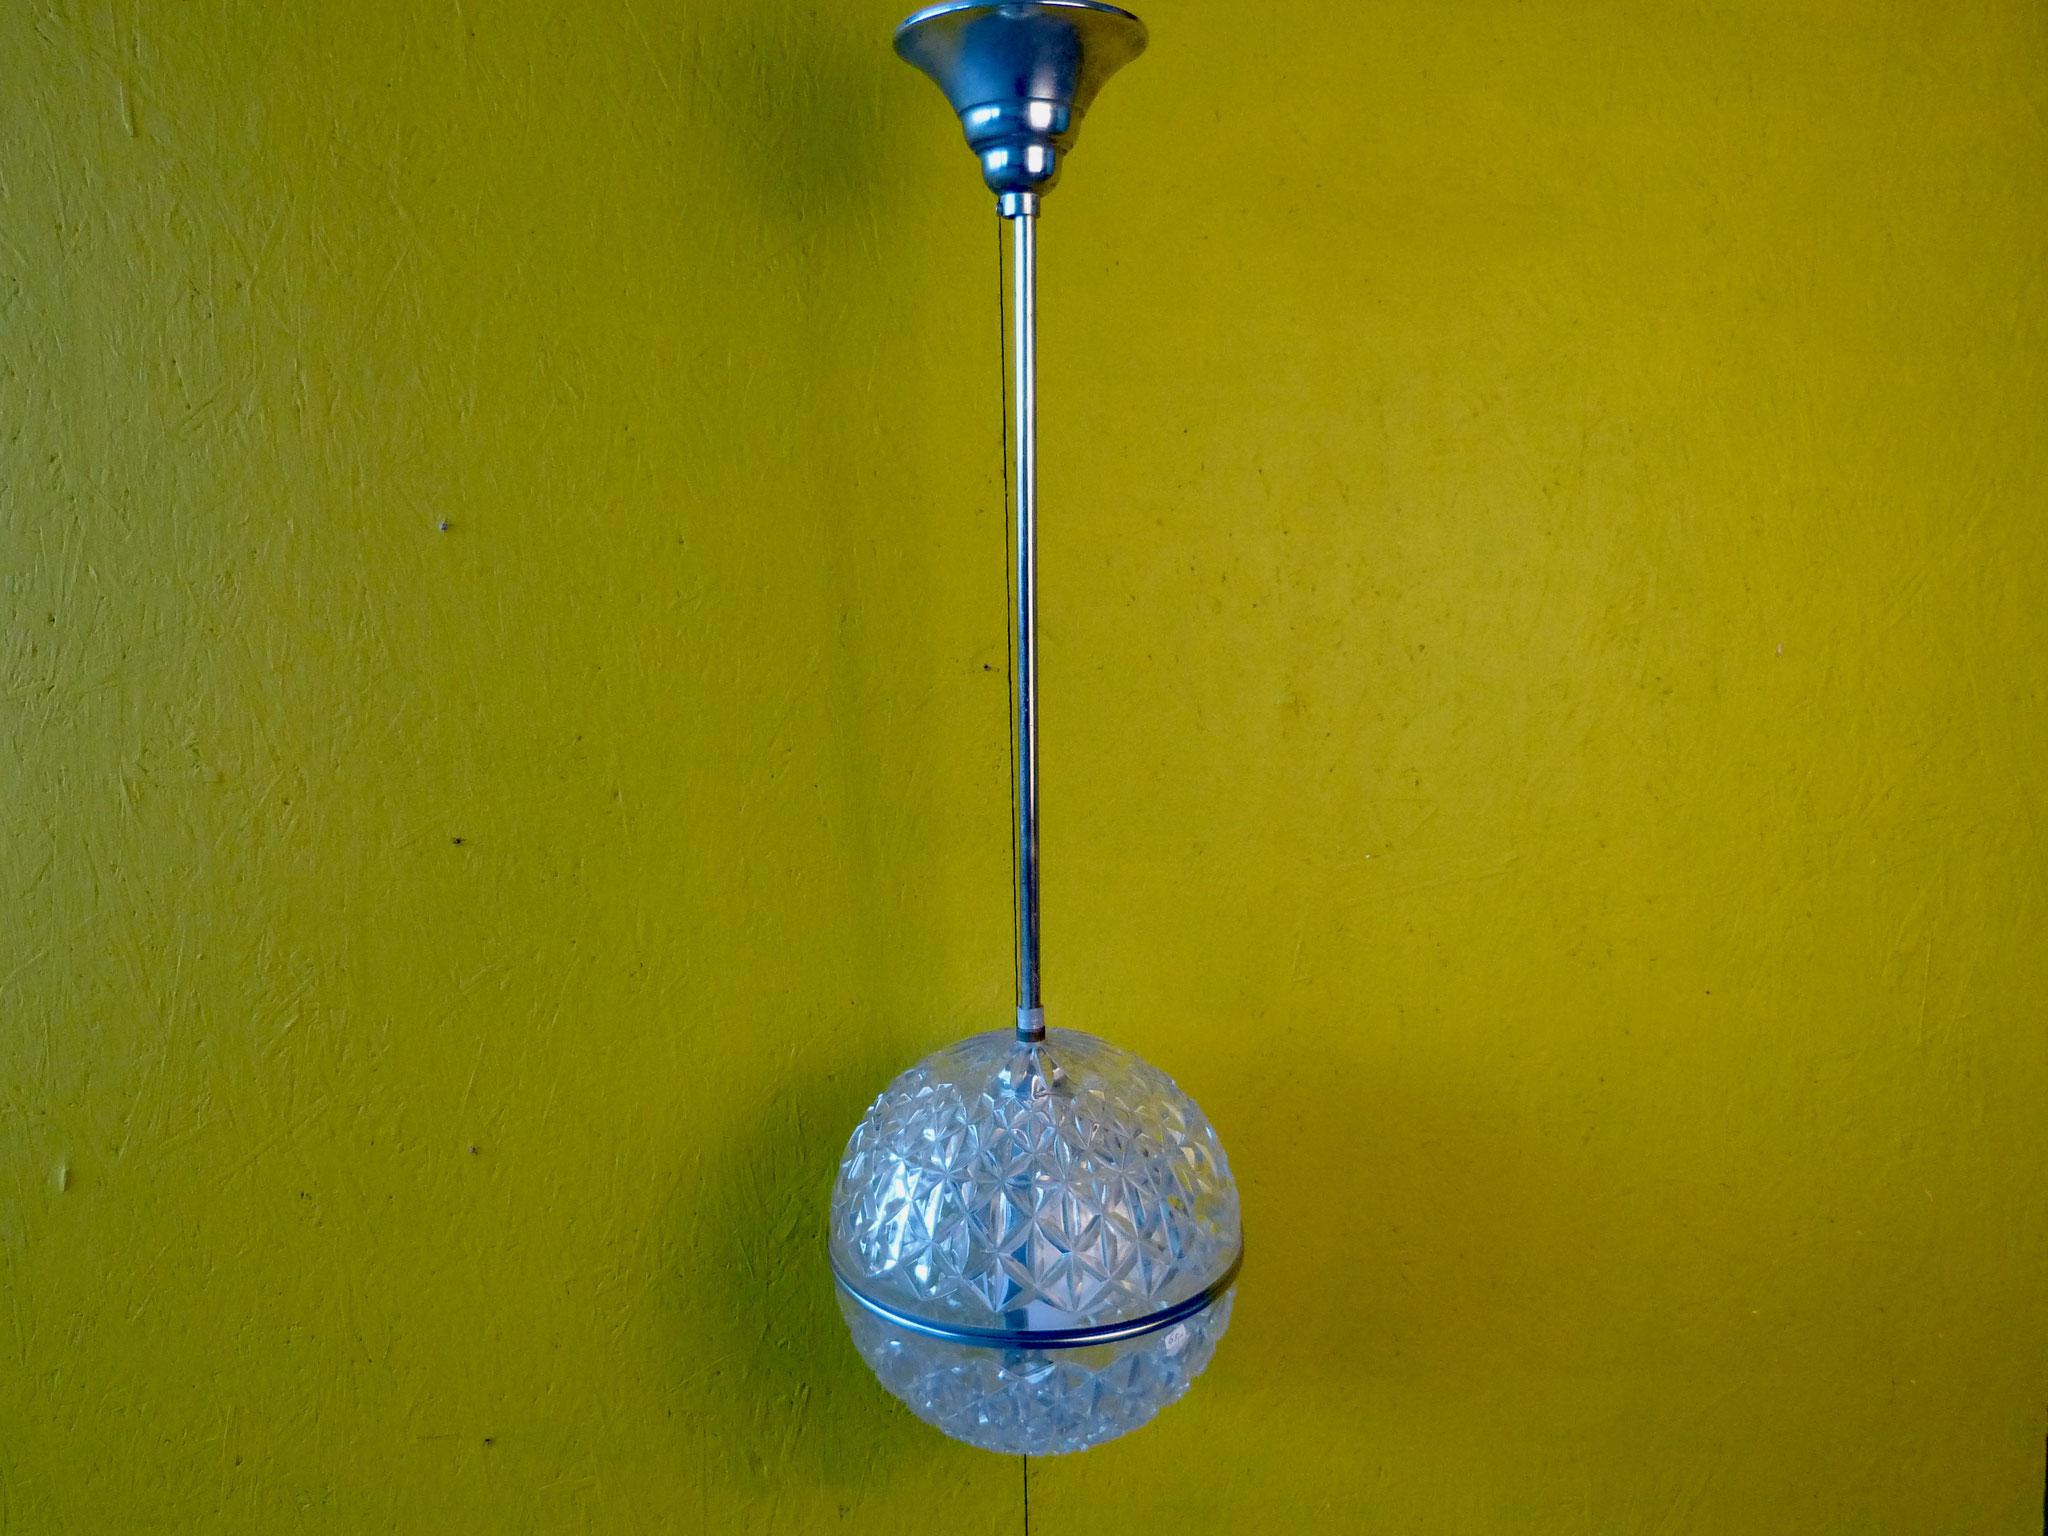 Hanglamp kristallen bol